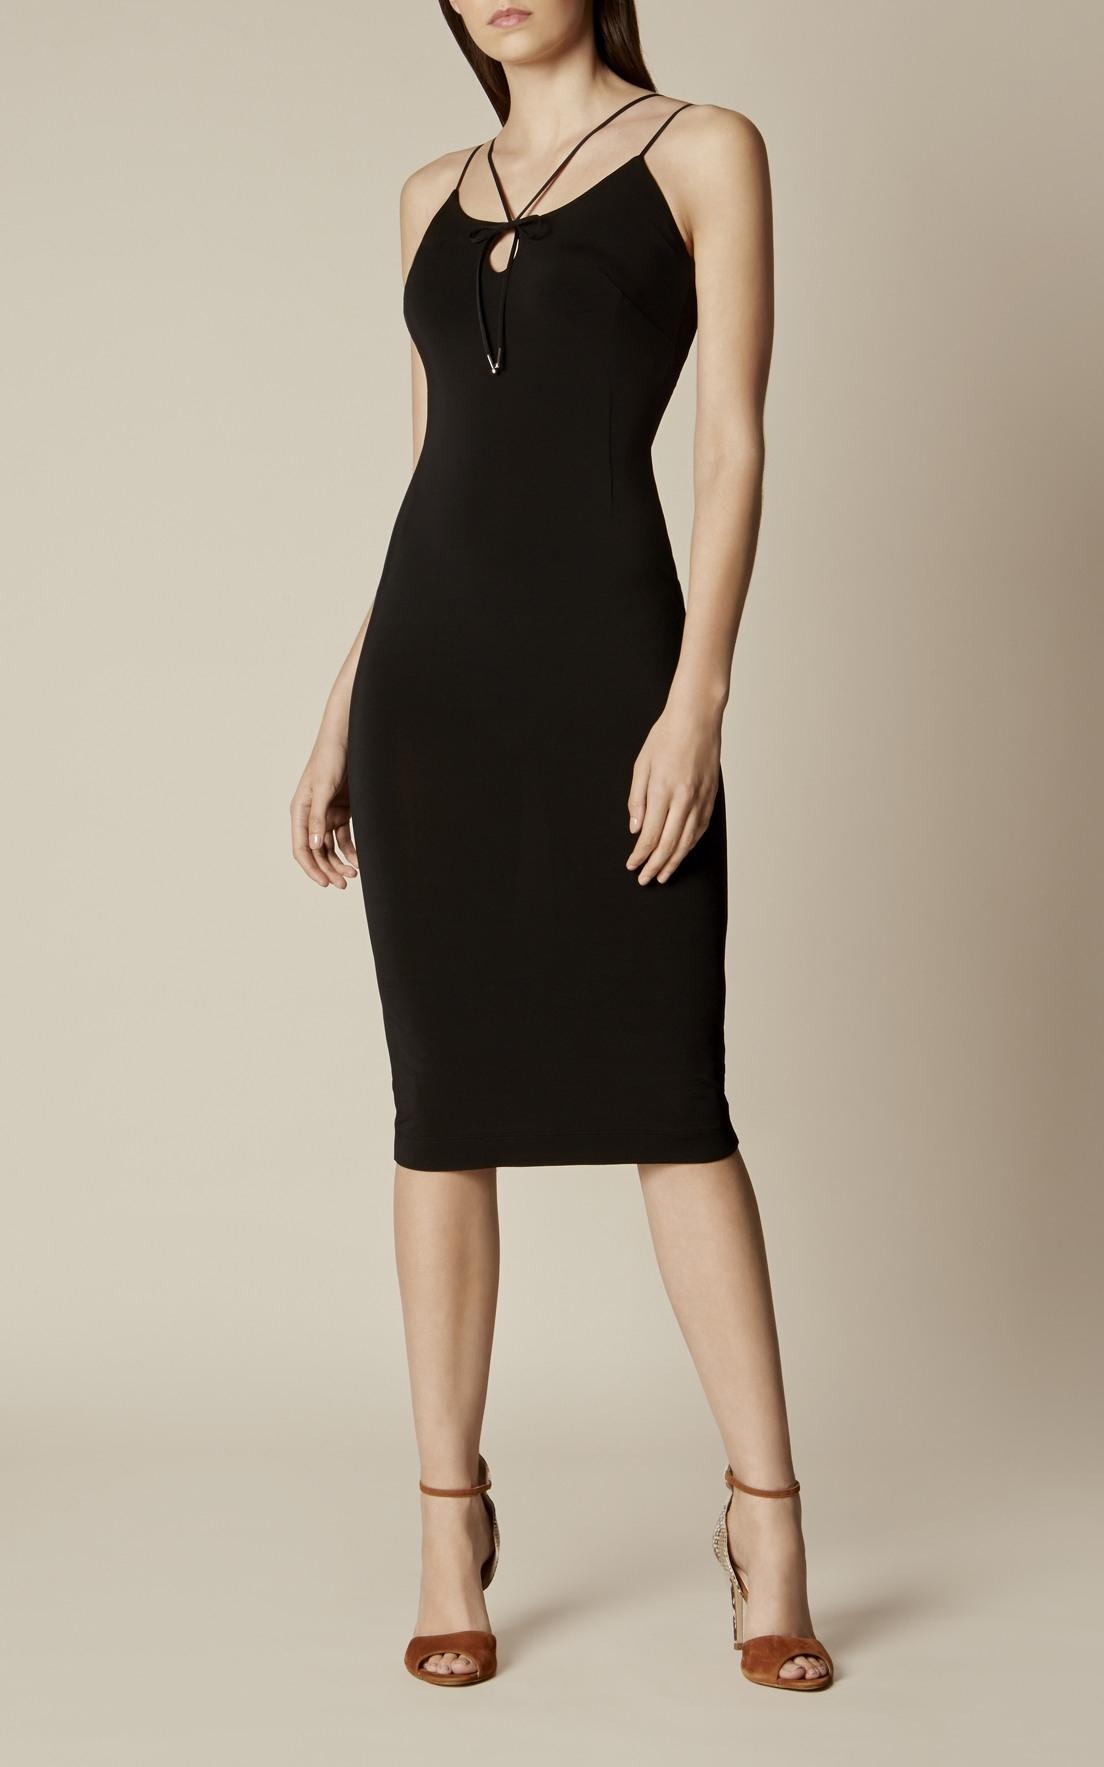 Formal Top Kleid Eng BoutiqueFormal Einzigartig Kleid Eng Spezialgebiet